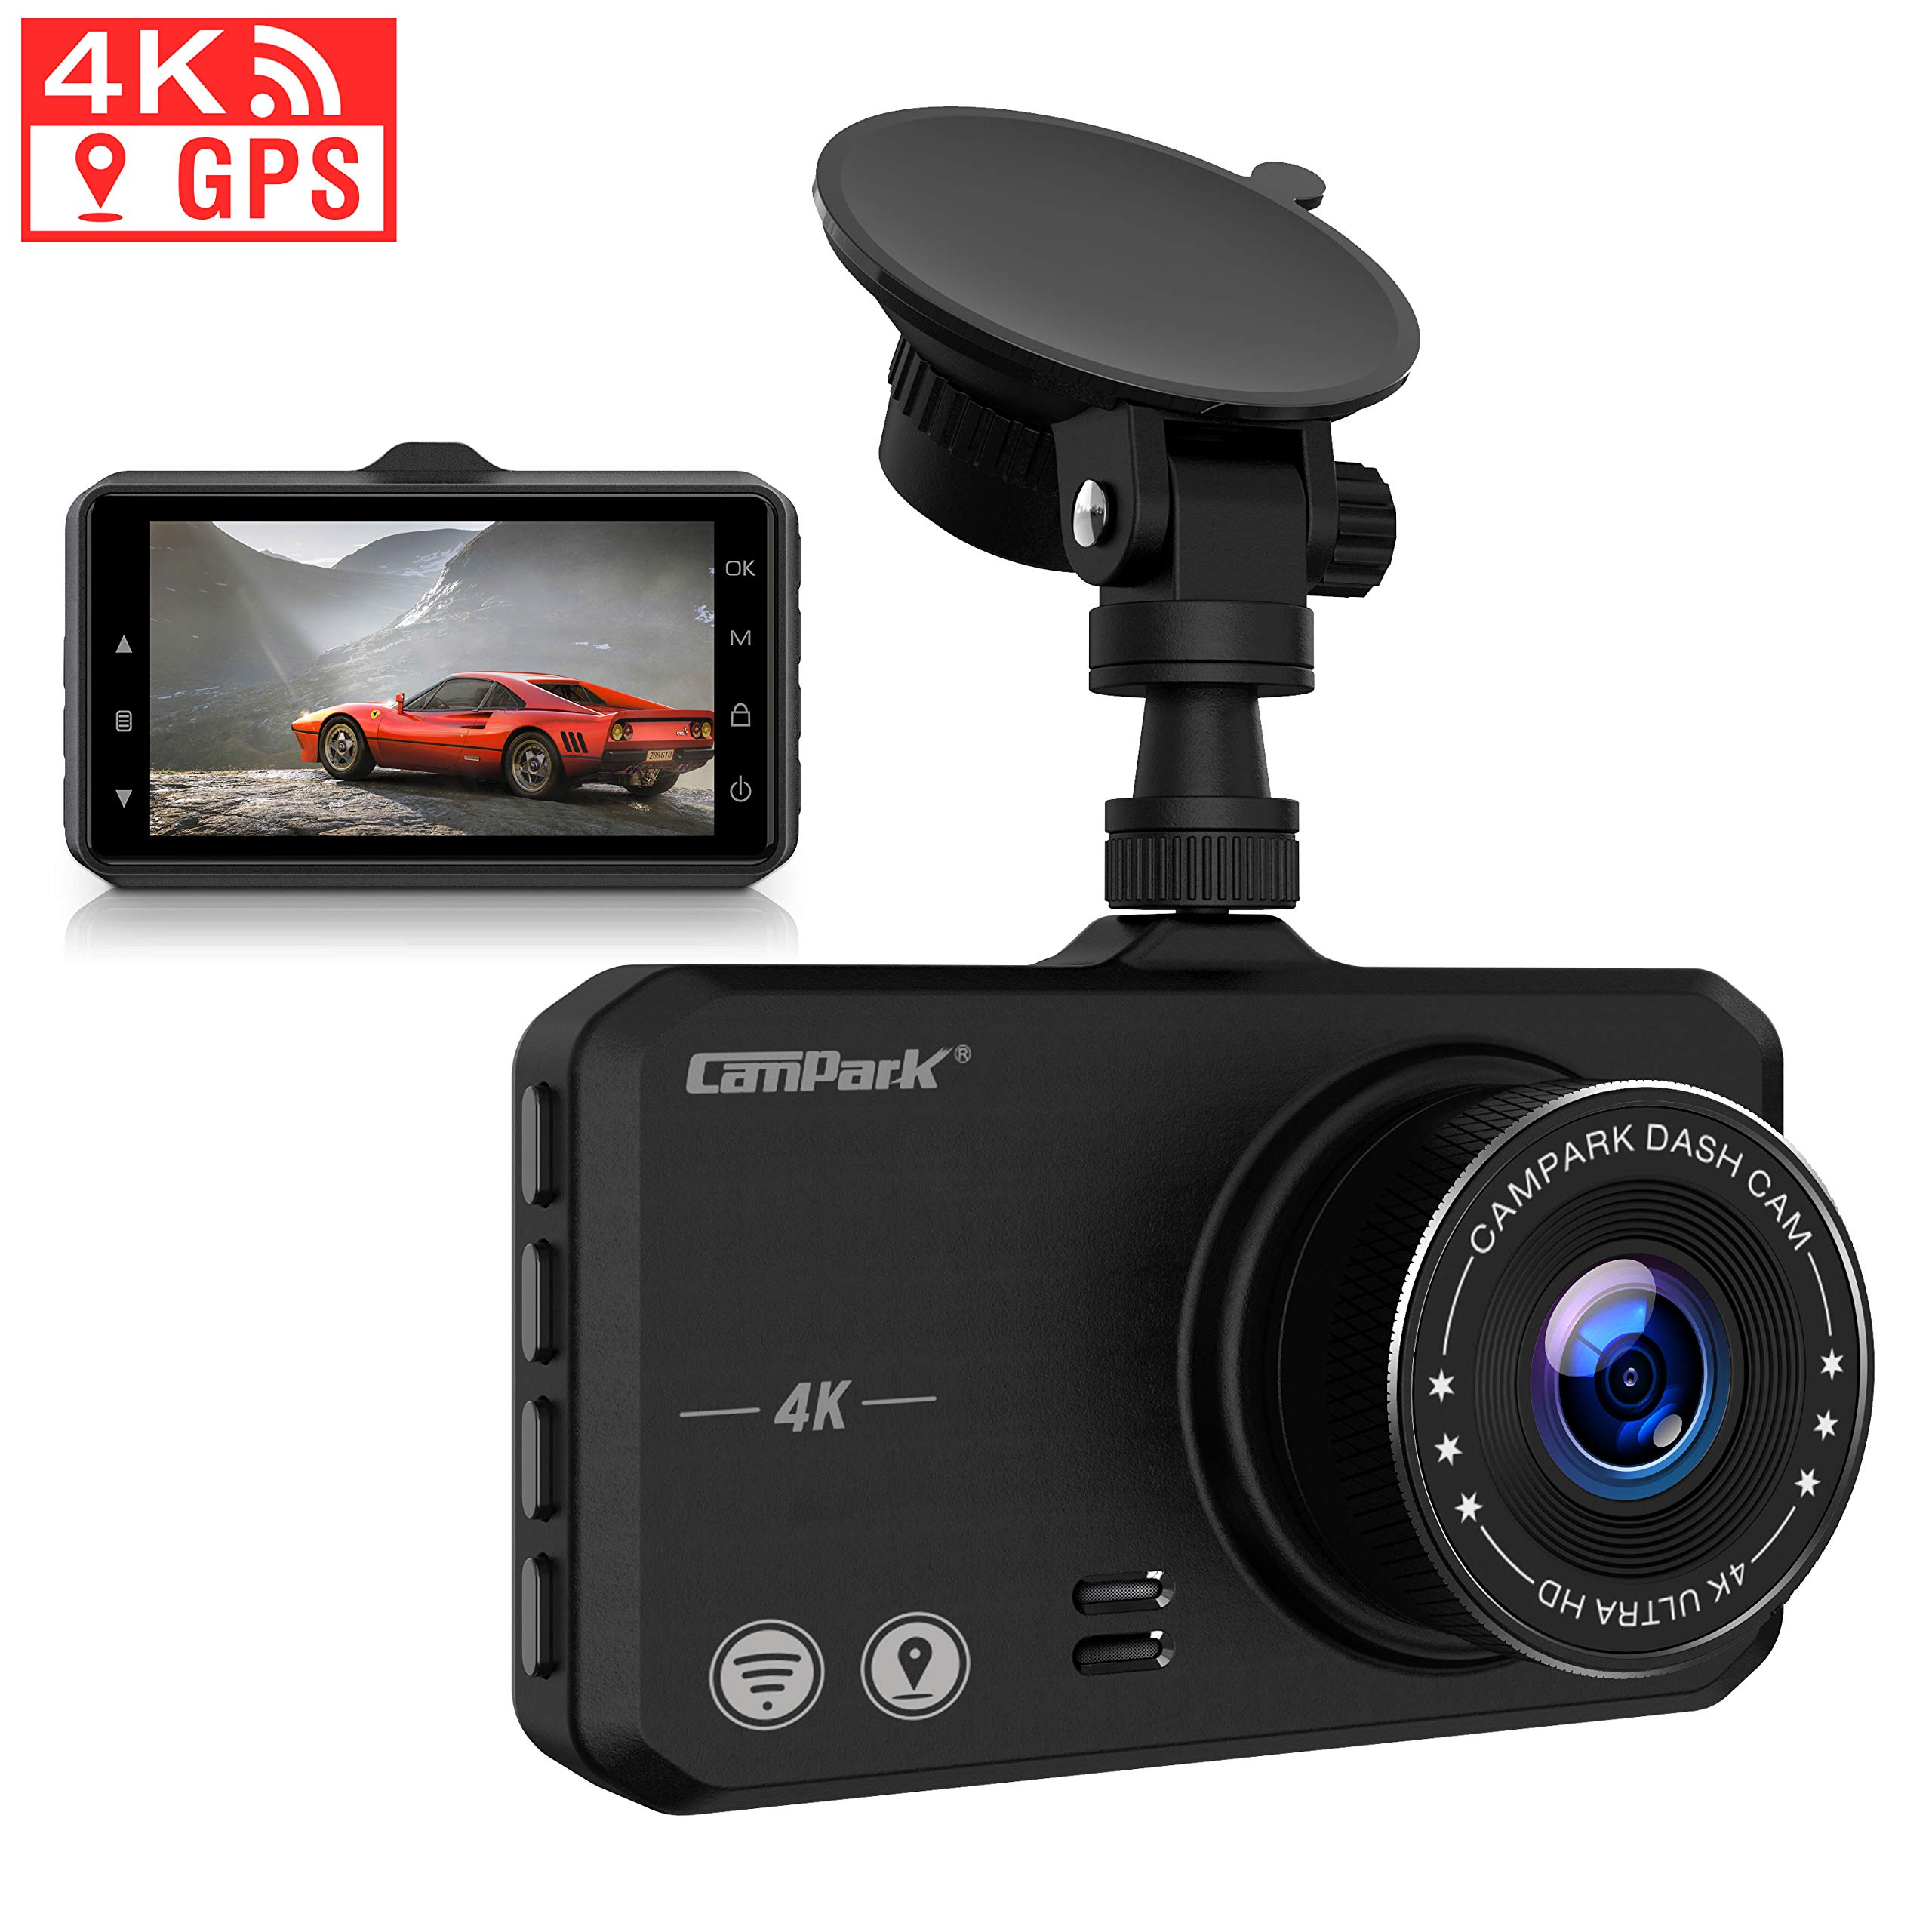 Campark Dashboard Recorder Recording G Sensor